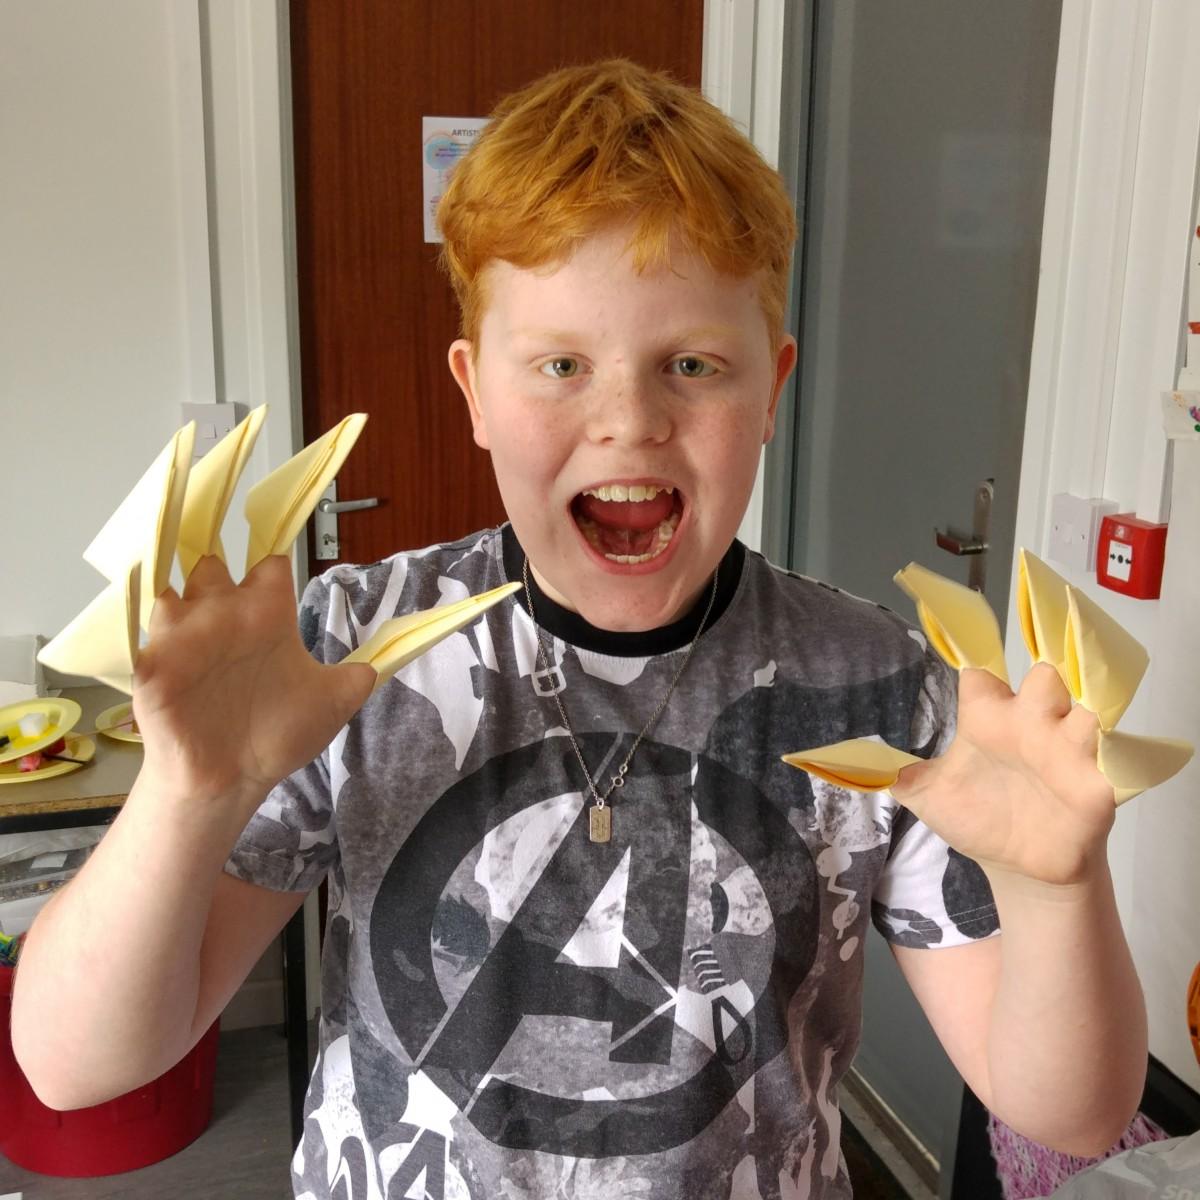 Boy wearing sharp paper nails